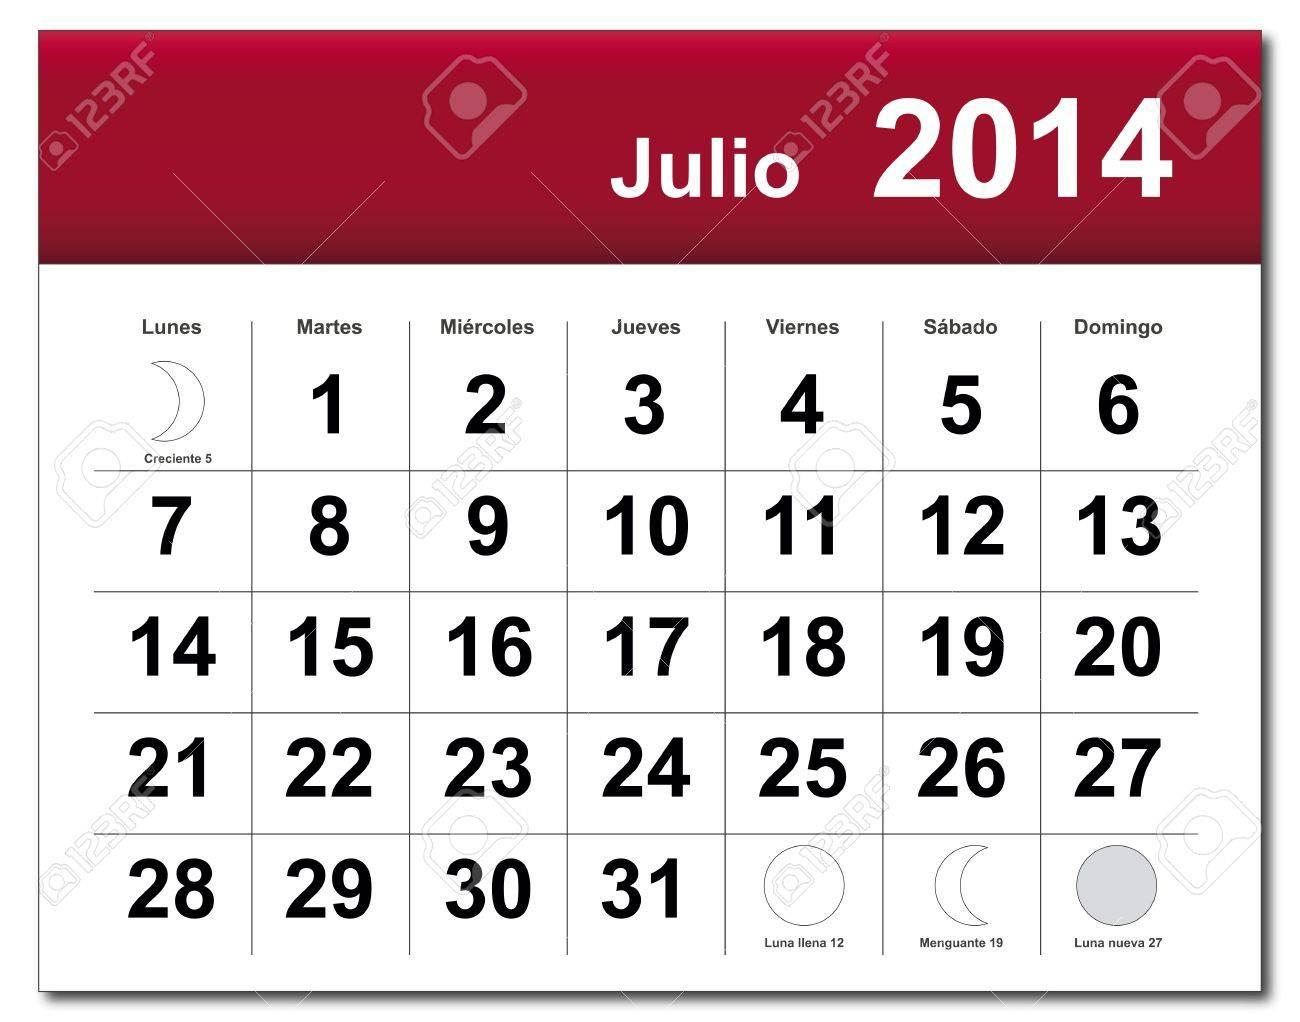 Spanish version of July 2014 calendar. Stock Vector - 21643844